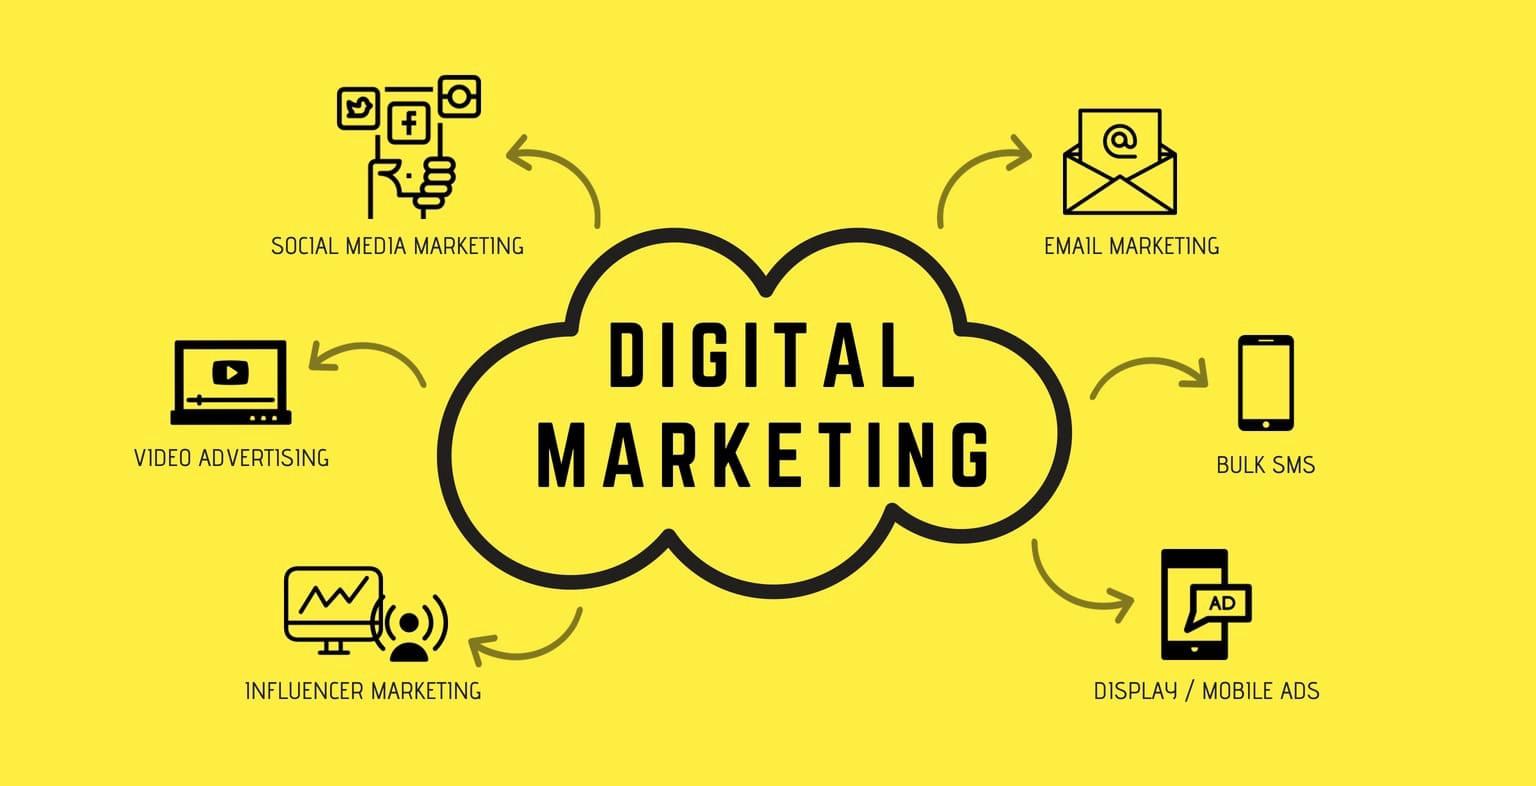 digital marketing nordics